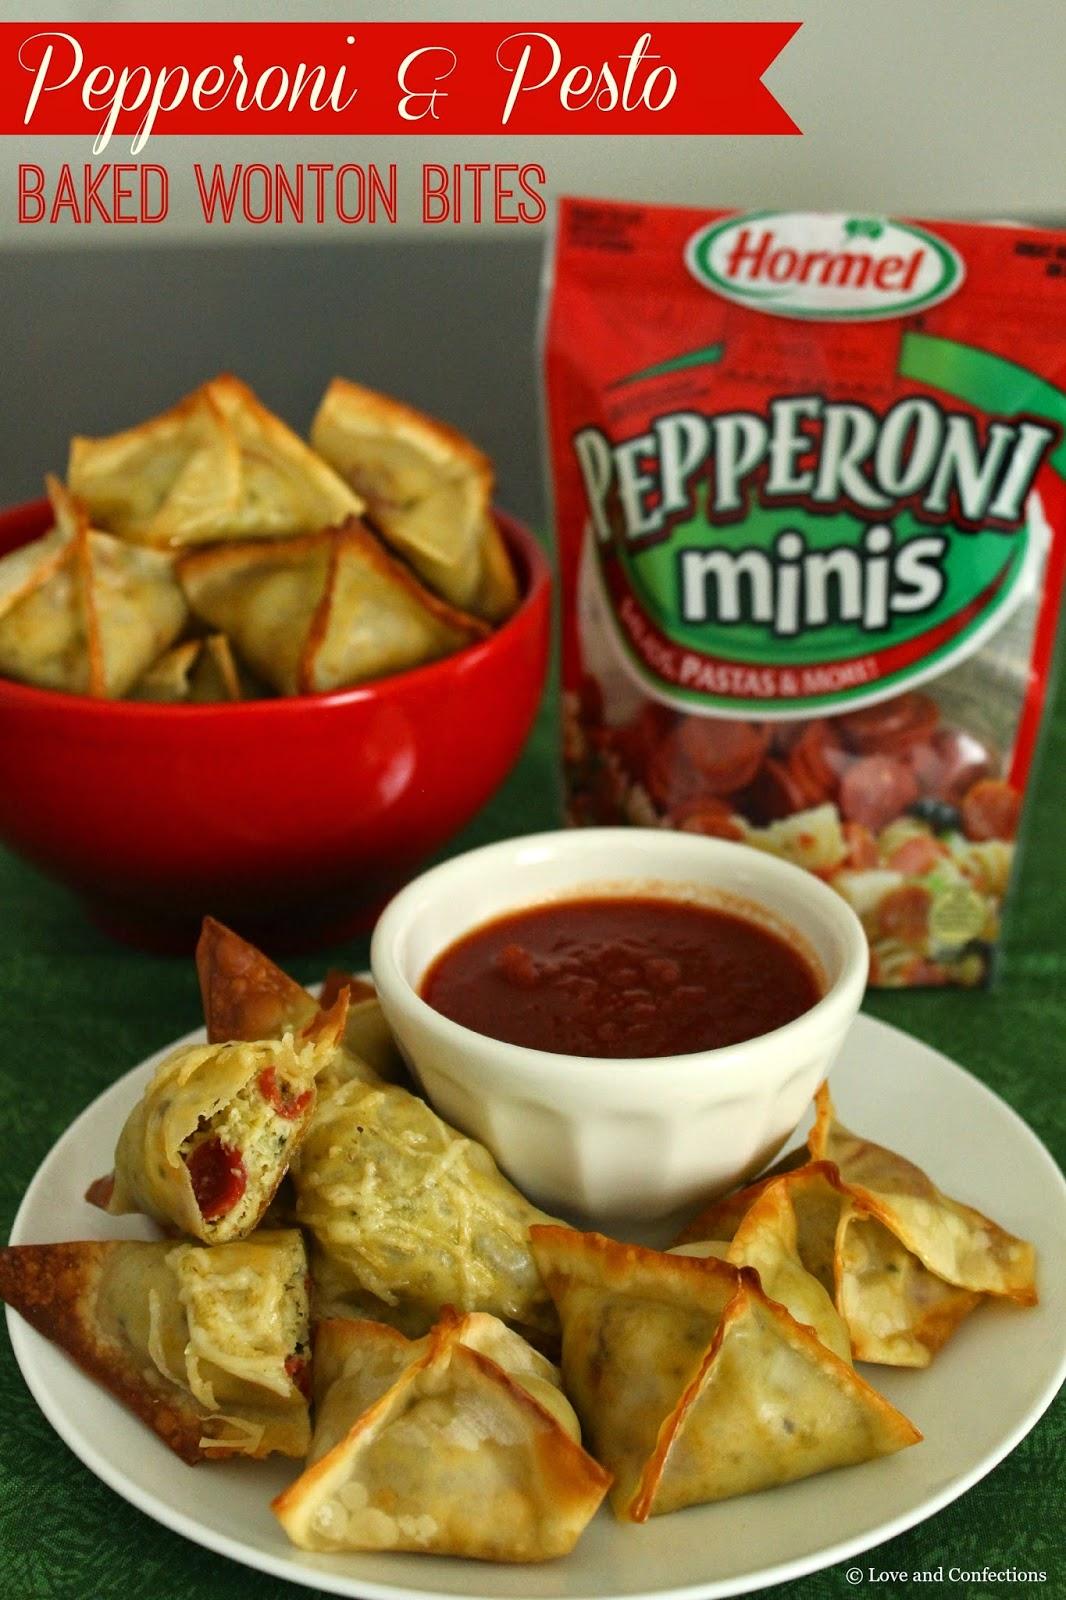 Pepperoni & Pesto Baked Wonton Bites from LoveandConfections.com